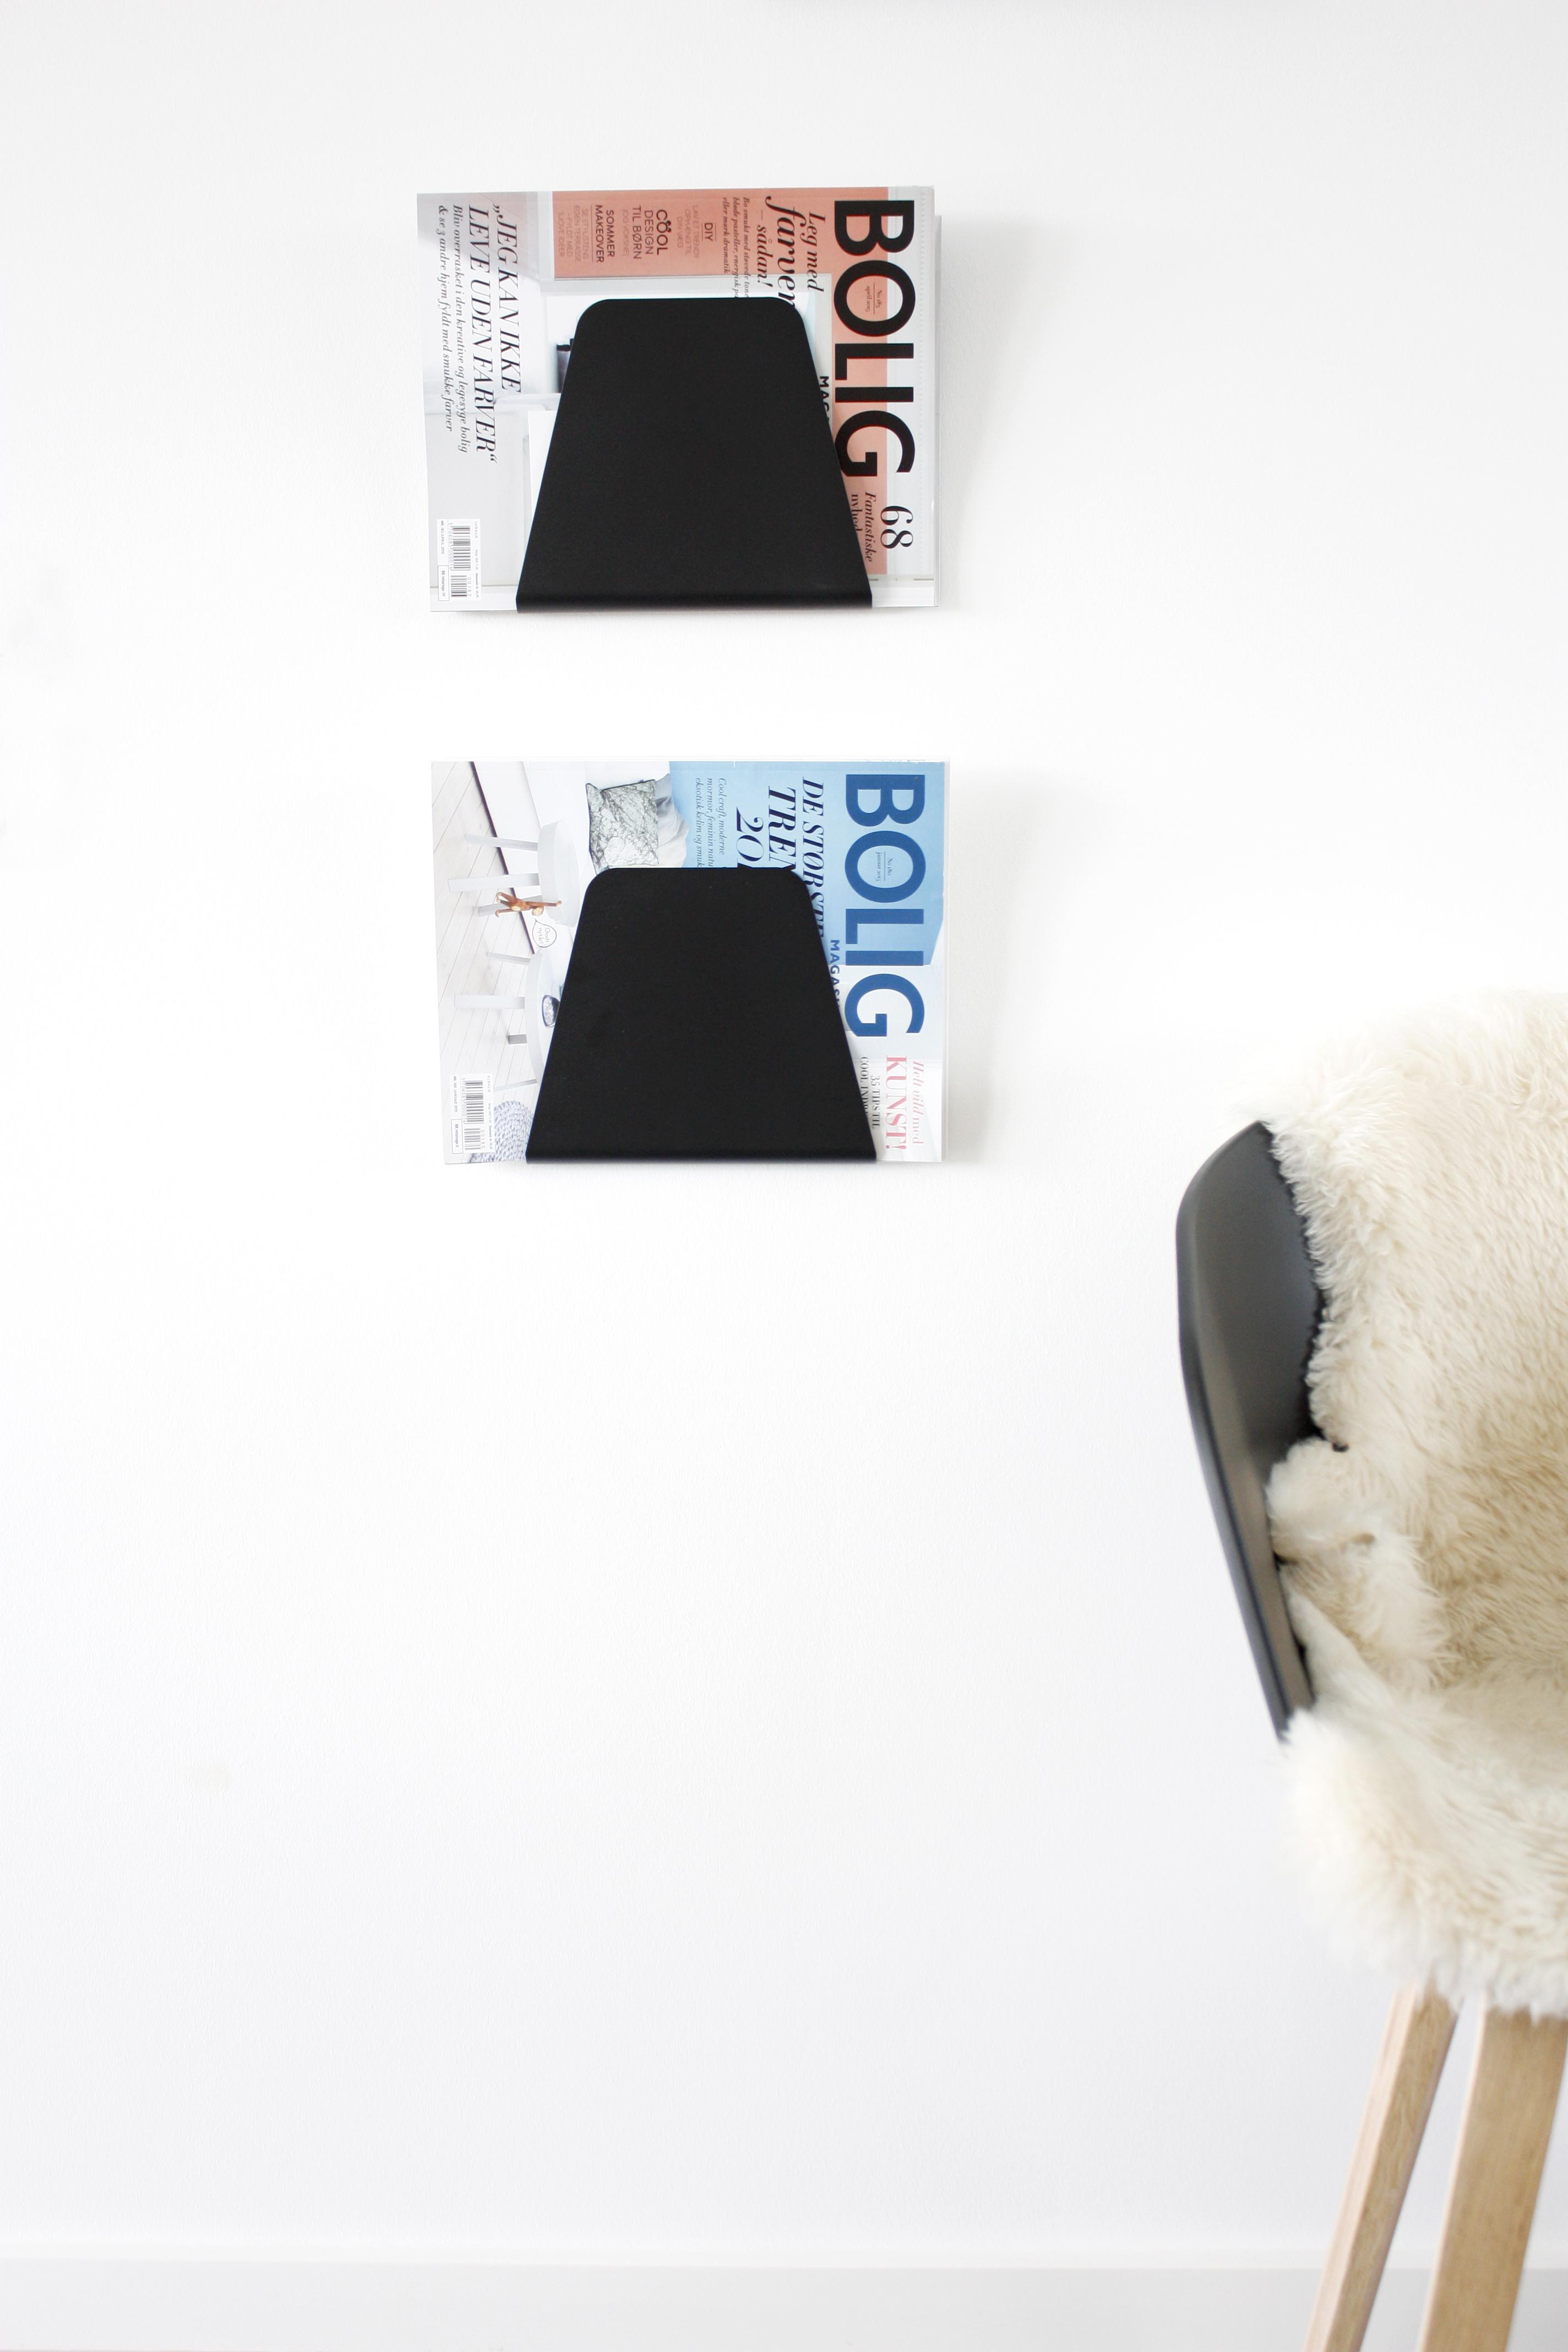 Nur-Curve-Magasinholder-magazineholder-bladholder-avisholder-Magazinedisplay-Bolig-Interiør-Office-N